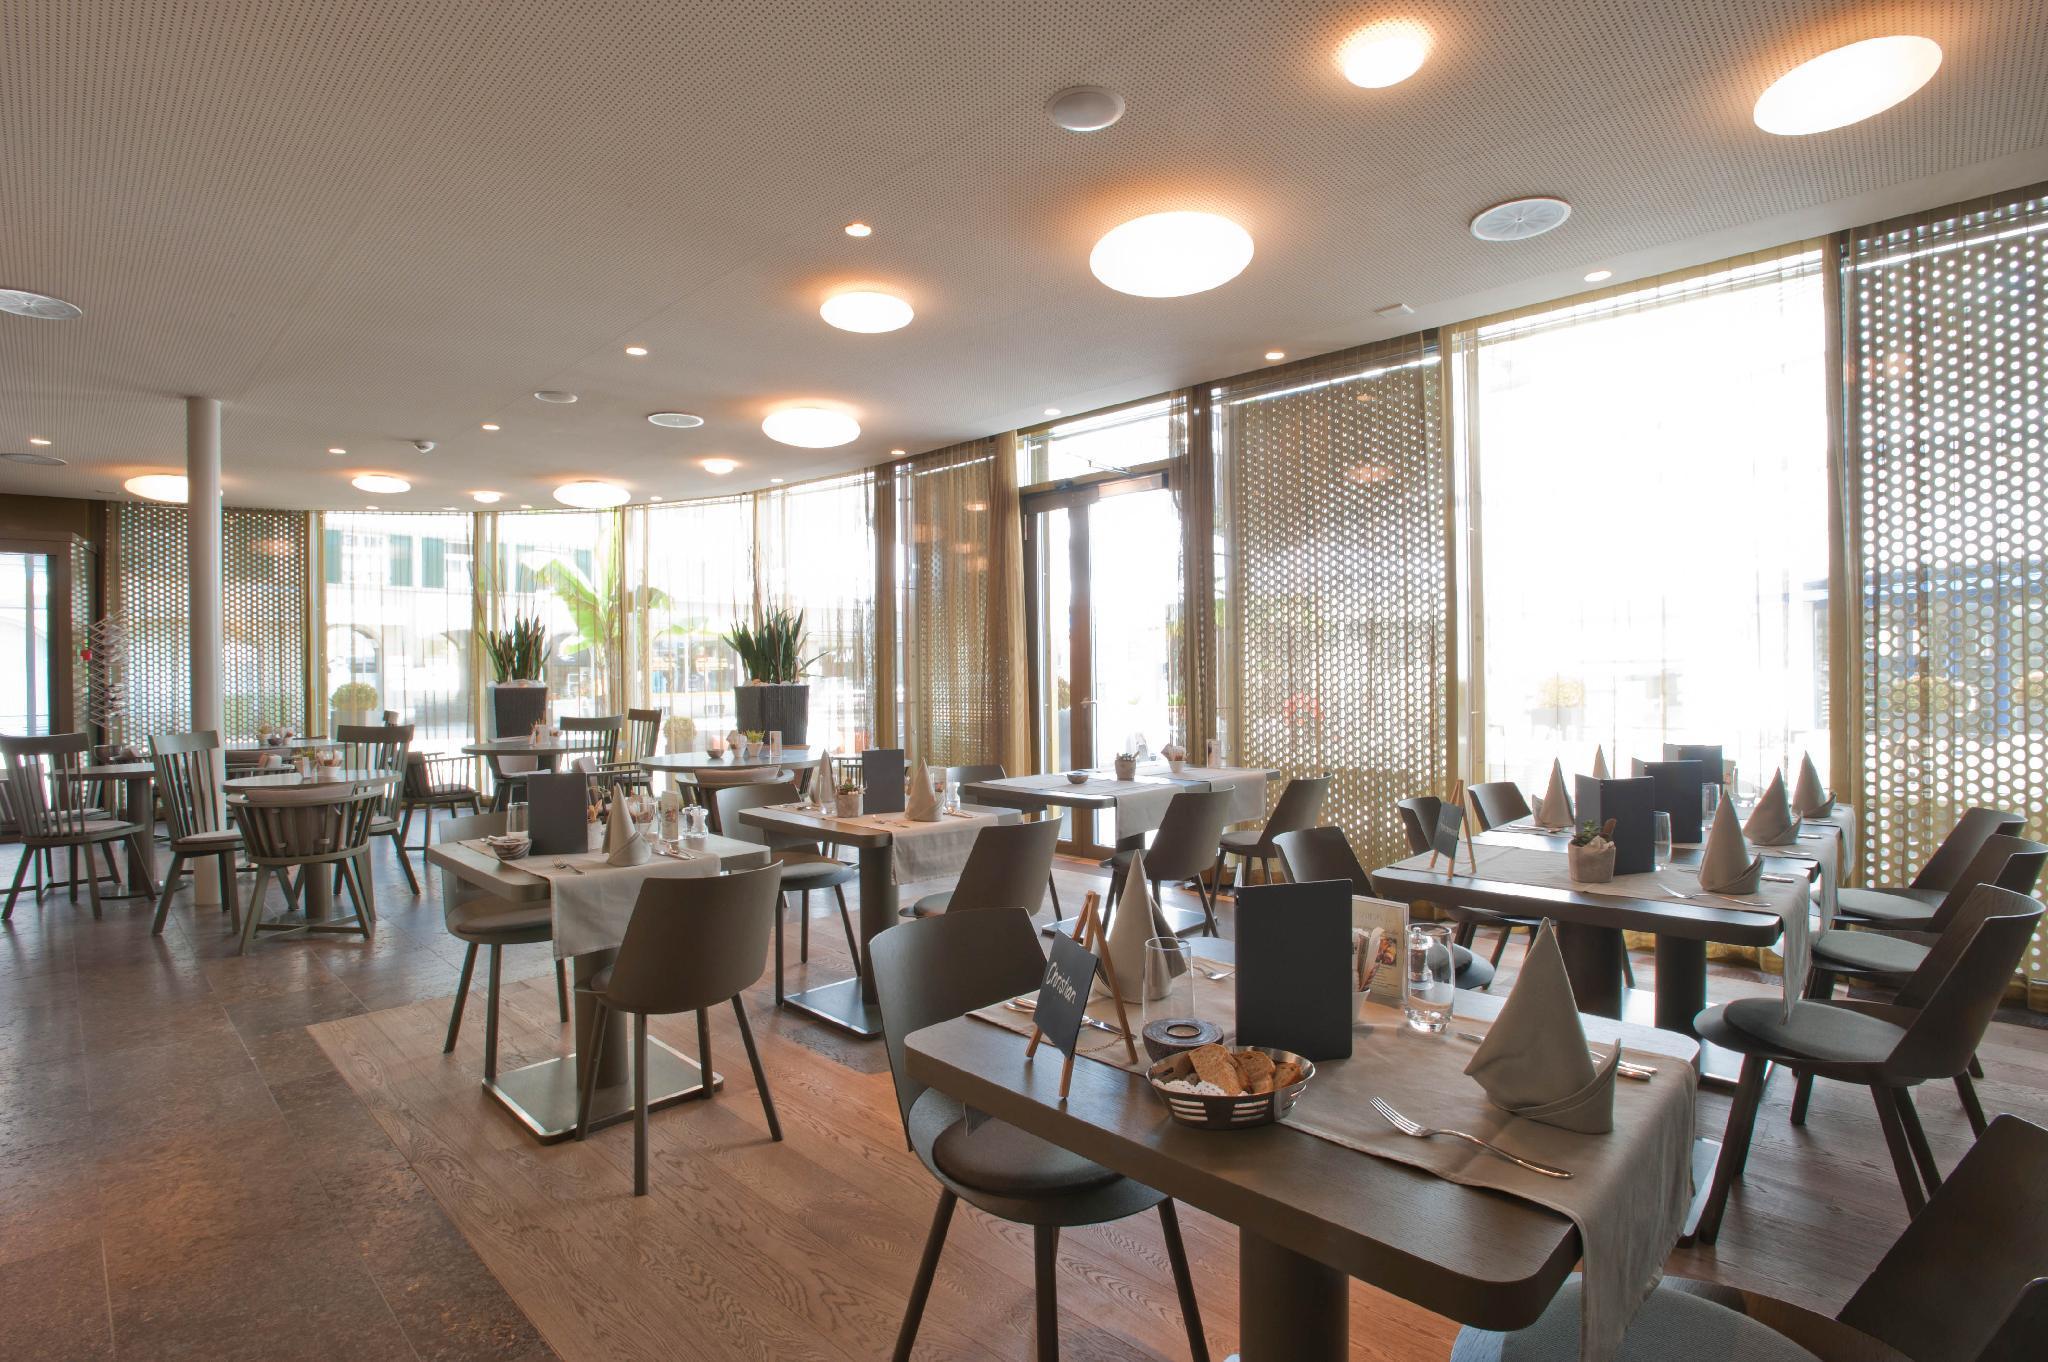 Herisau Swiss Quality Hotel, Appenzell Ausserrhoden